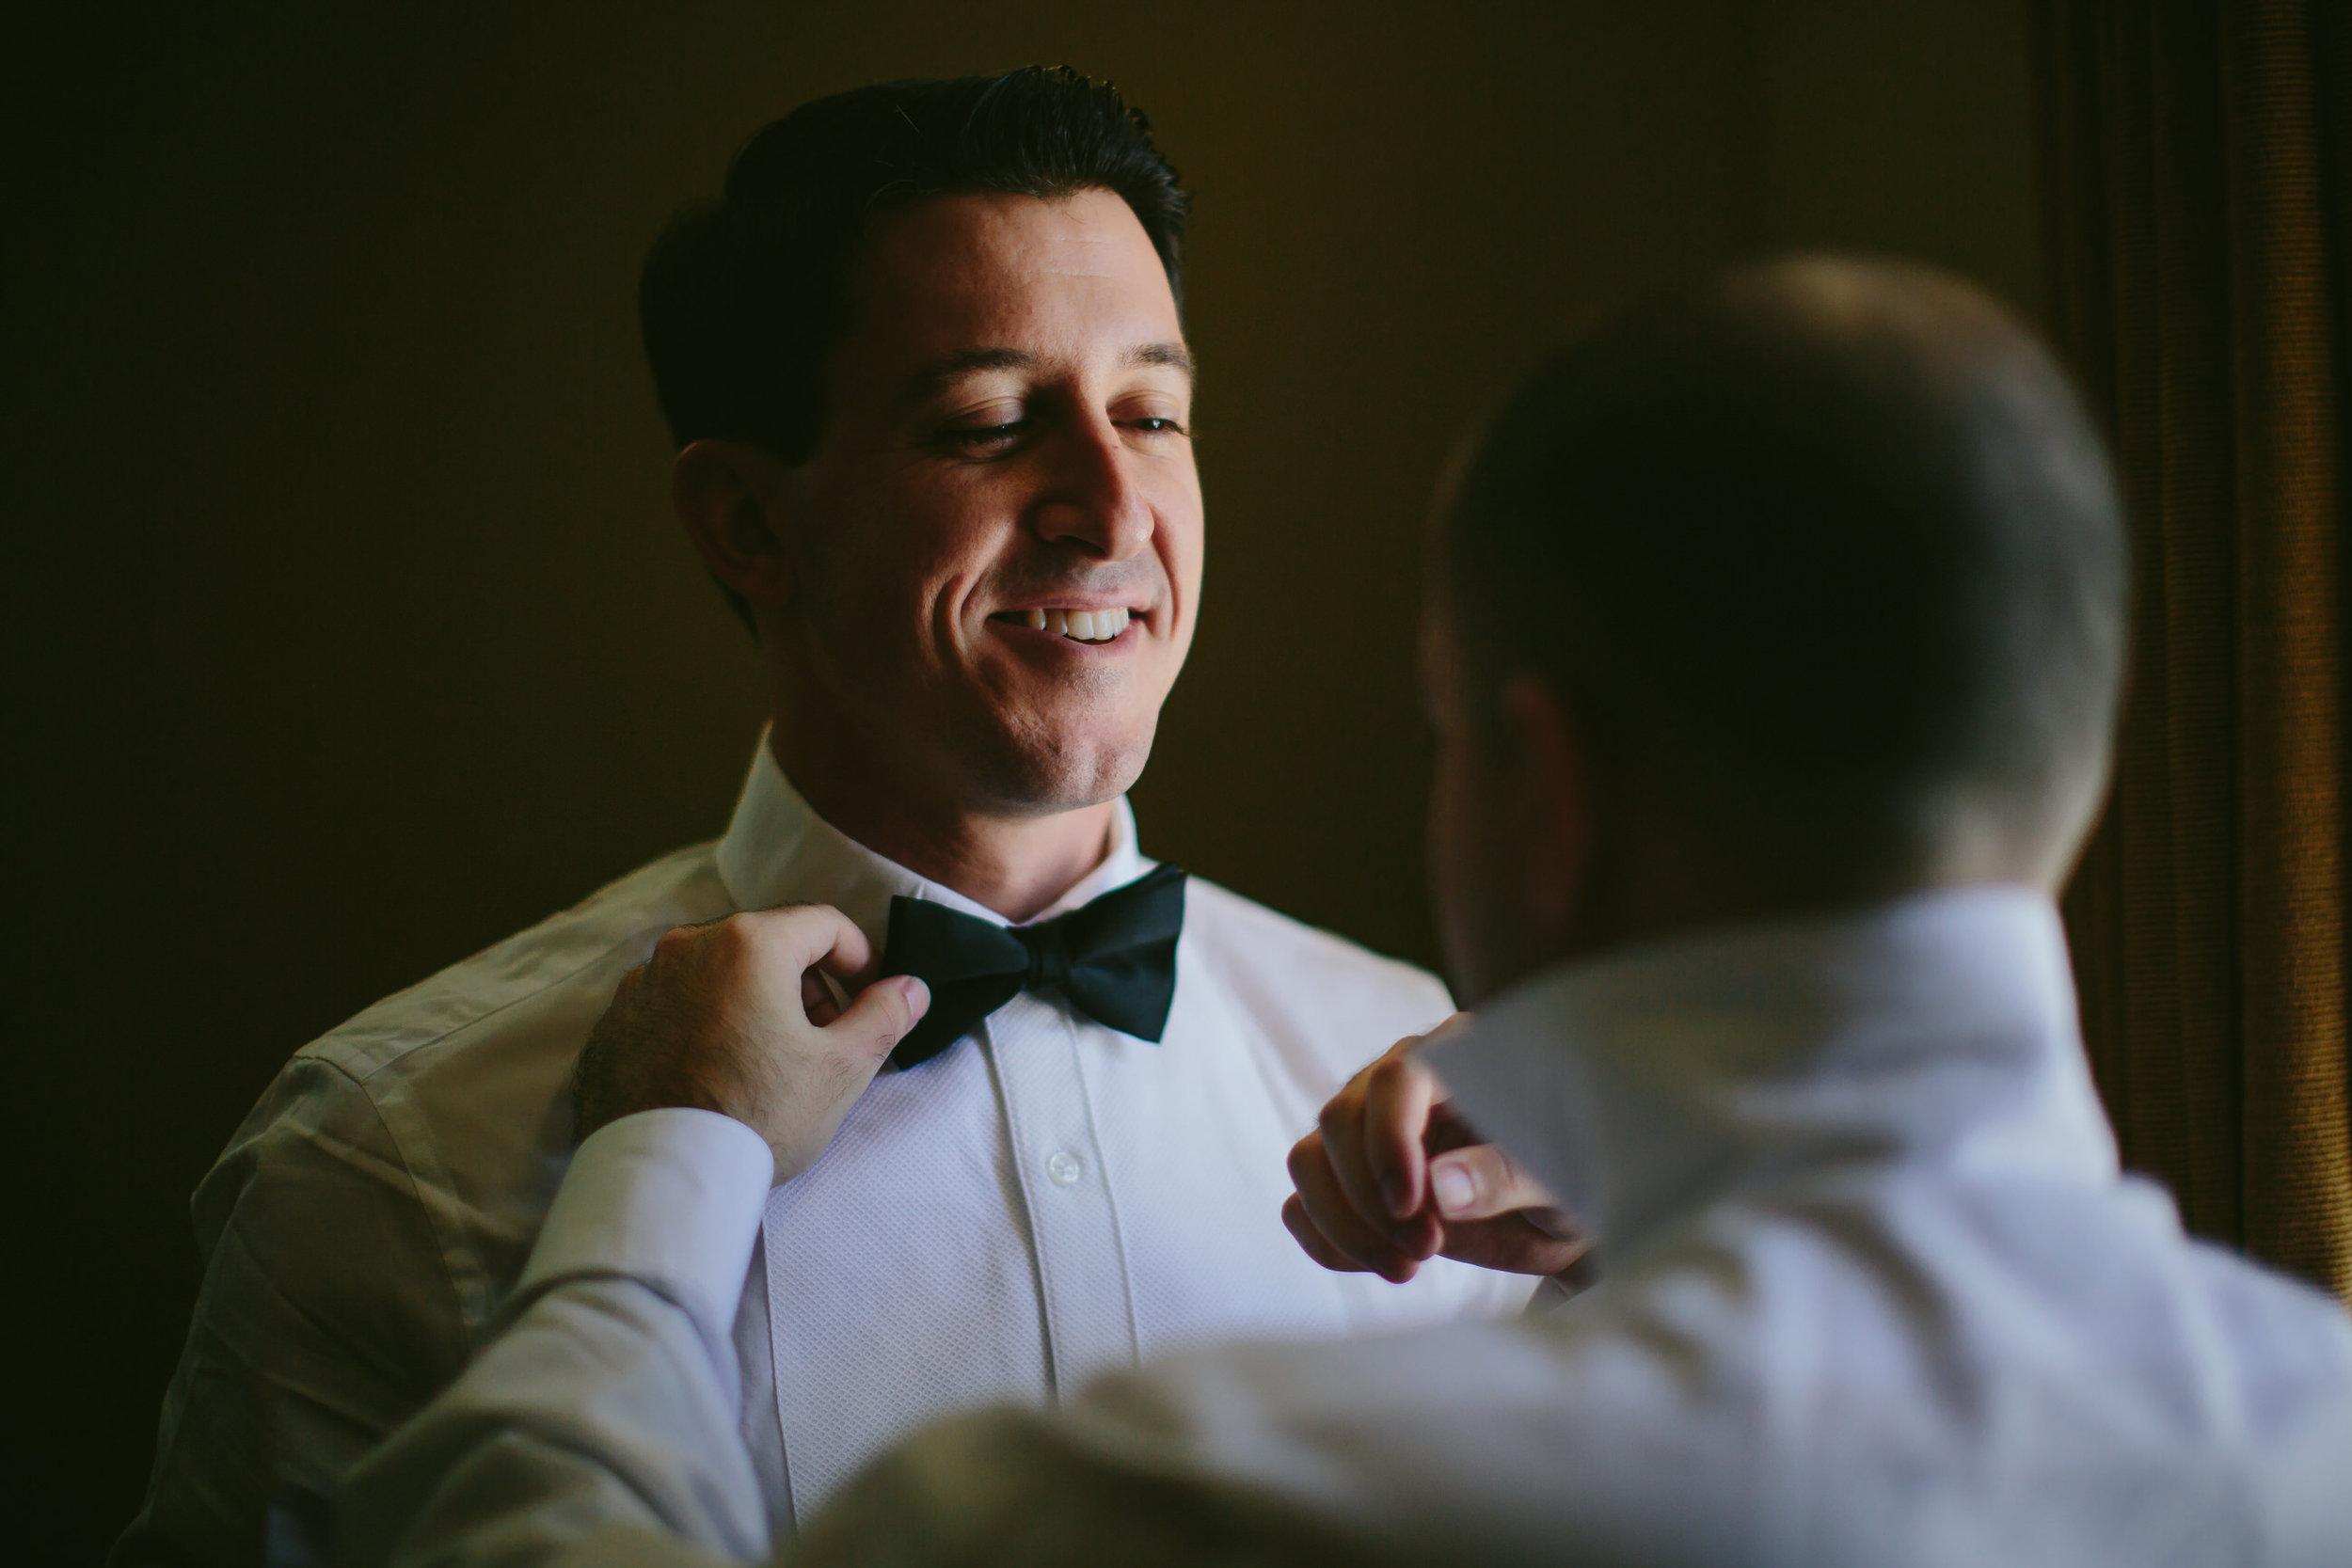 biltmore-wedding-groom-getting-ready-steph-lynn-photo-miami-14.jpg